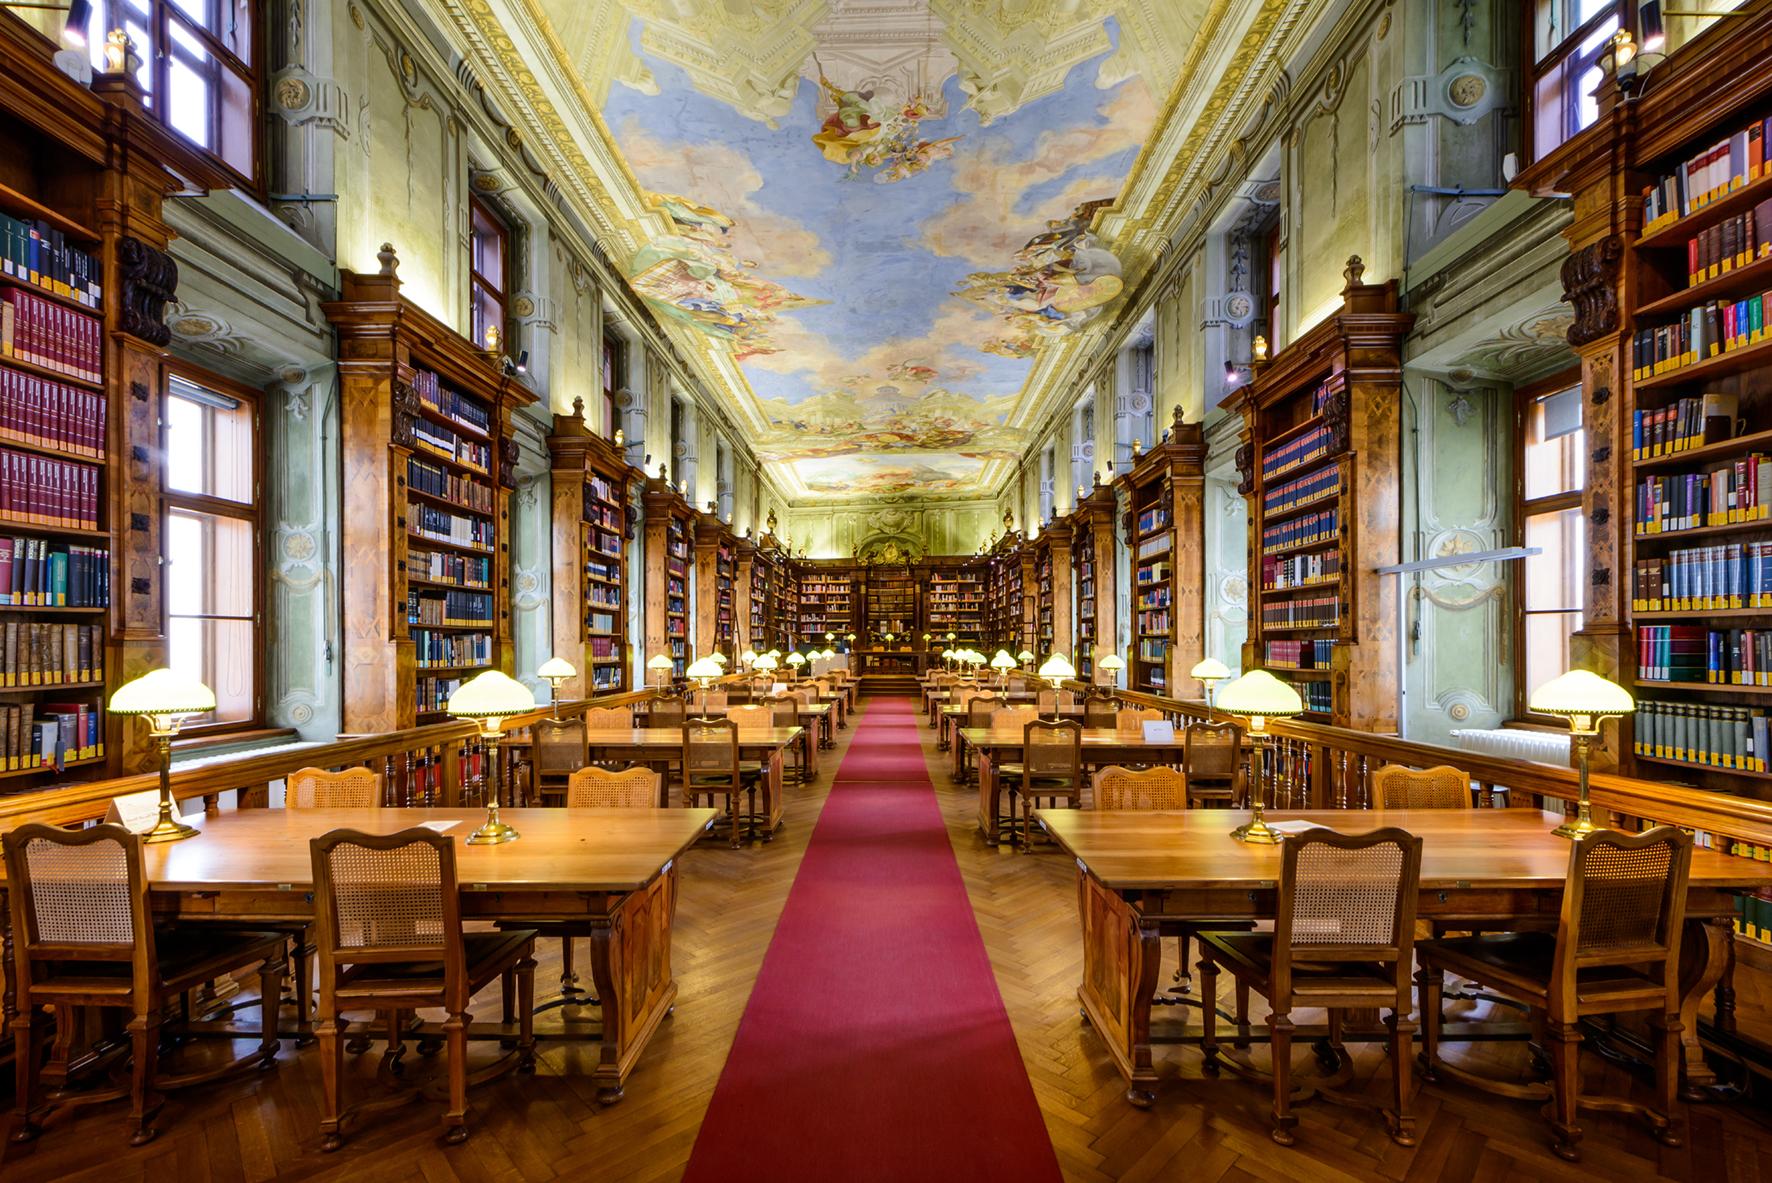 8. Biblioteca Nacional da Áustria2